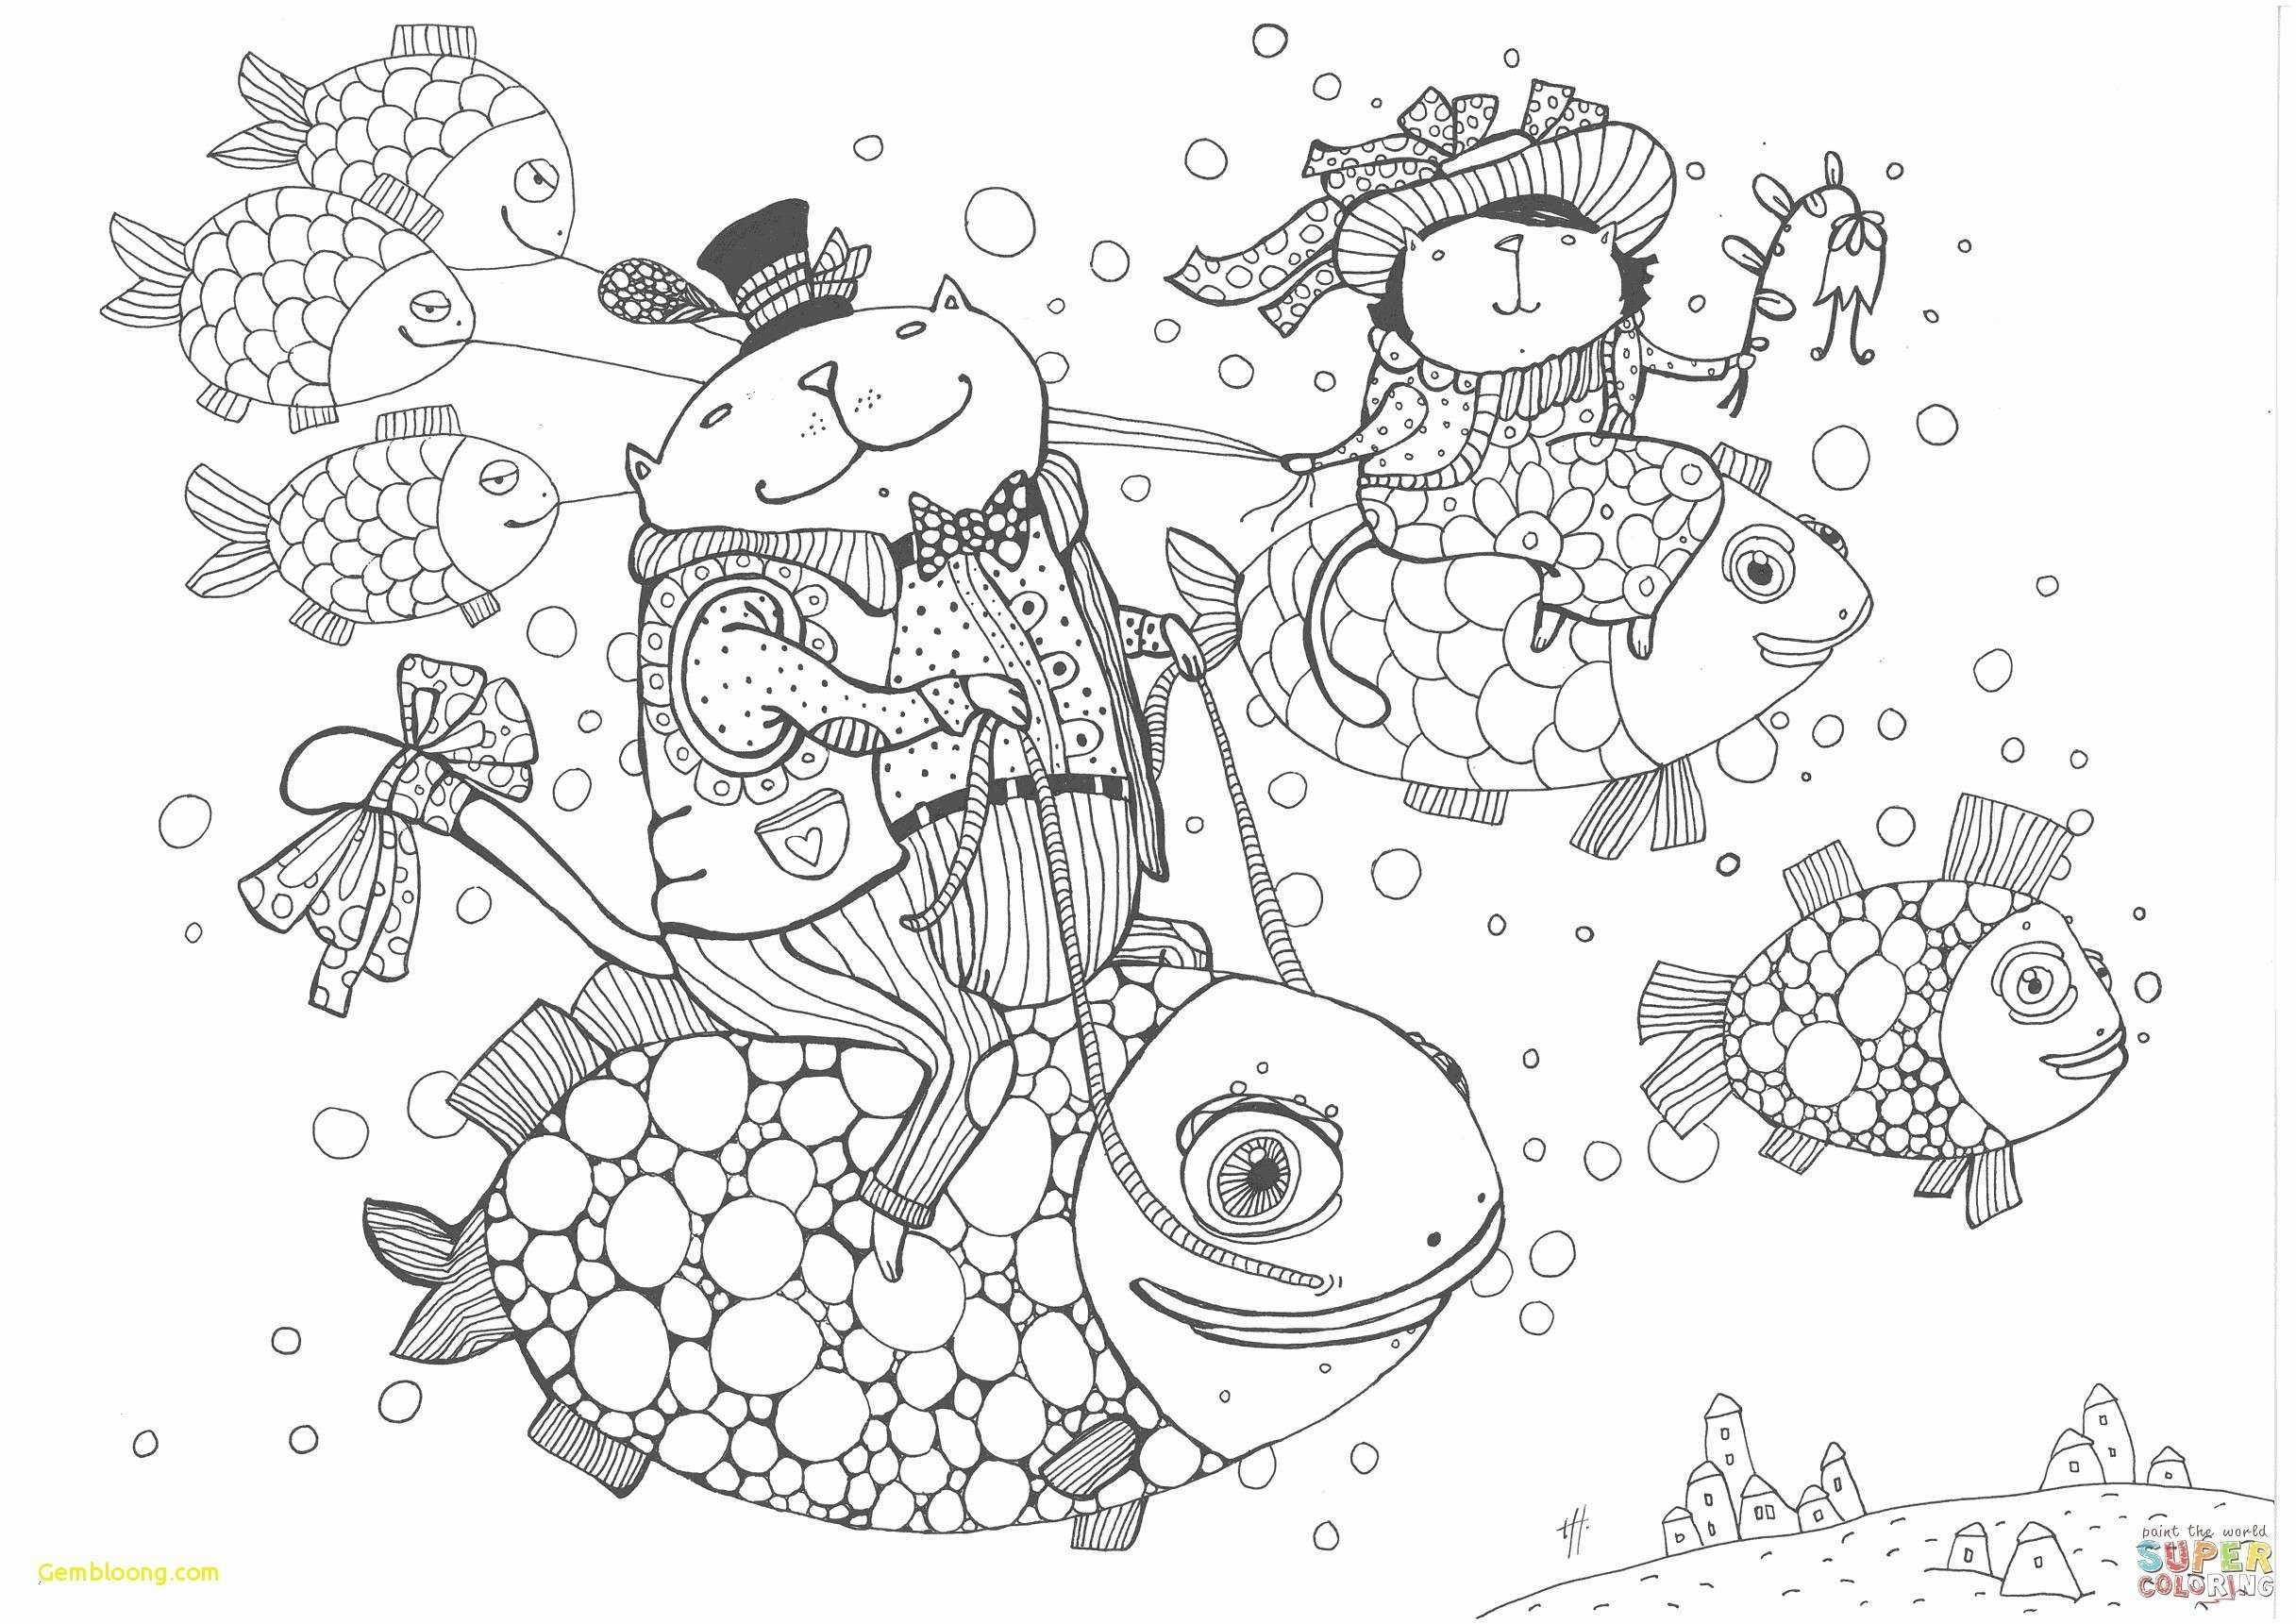 Ausmalbild Nexo Knights Inspirierend Frosch Malbuch Große Nexo Knights Ausmalbilder Zum Drucken Scha¶n Stock